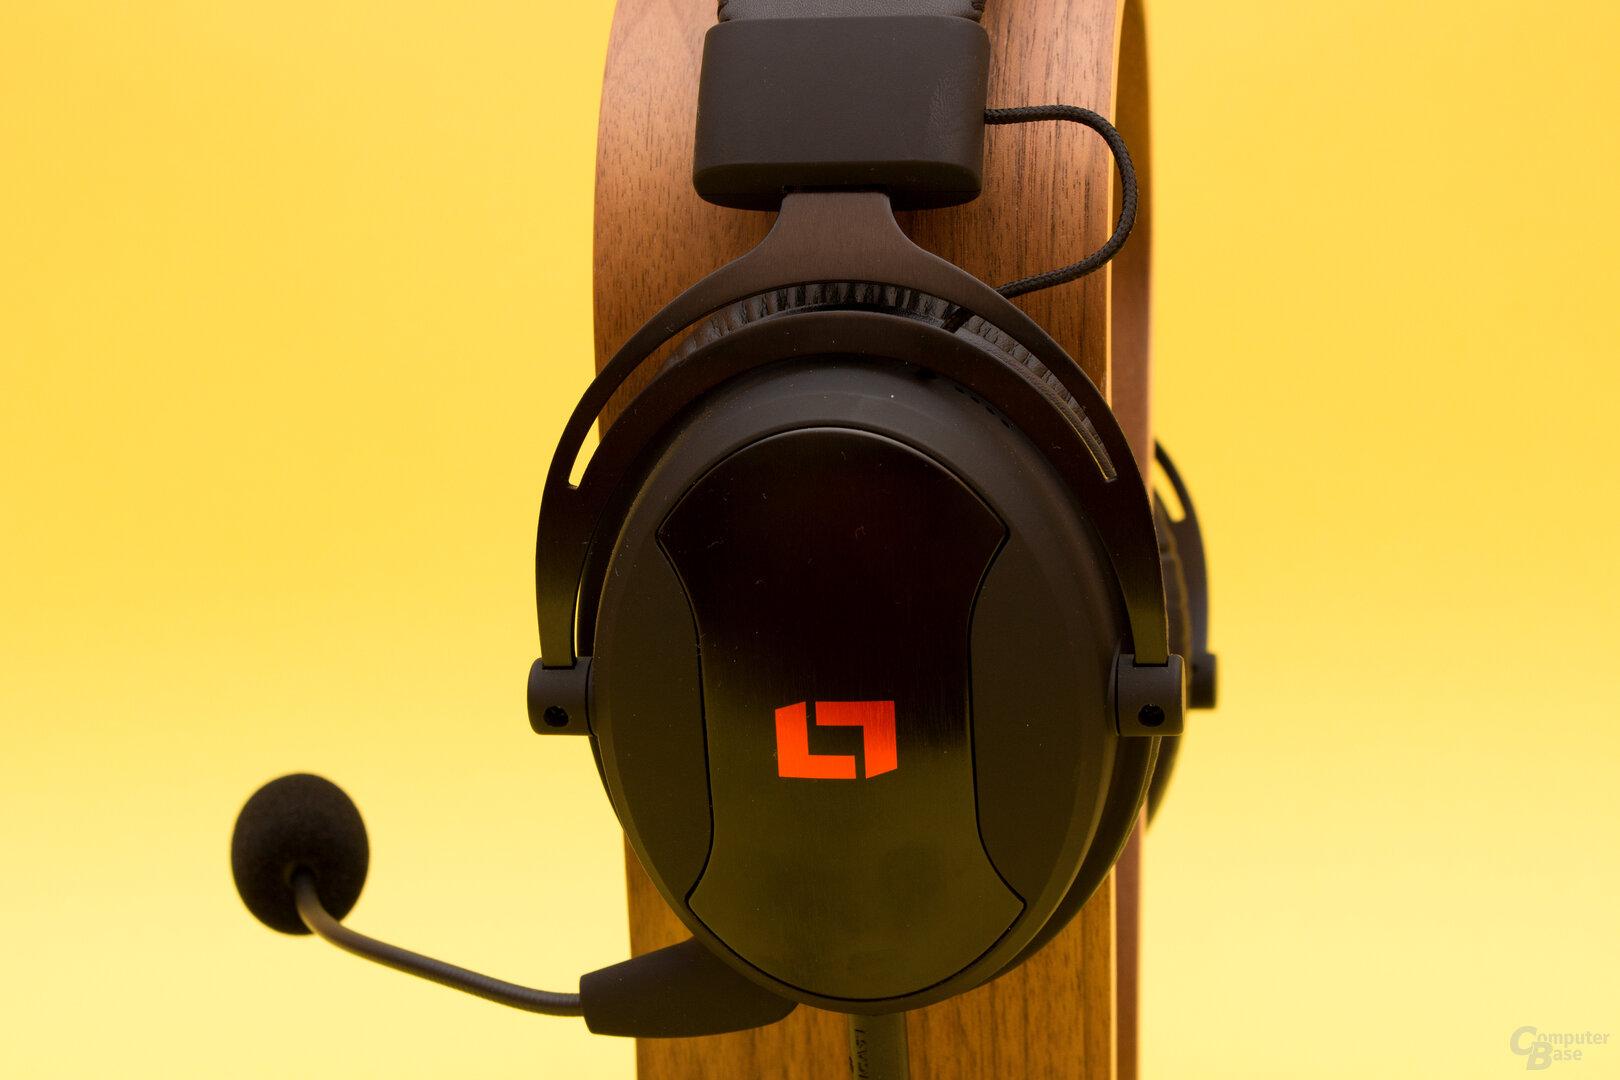 Gute Verarbeitung beim Lioncast LX55